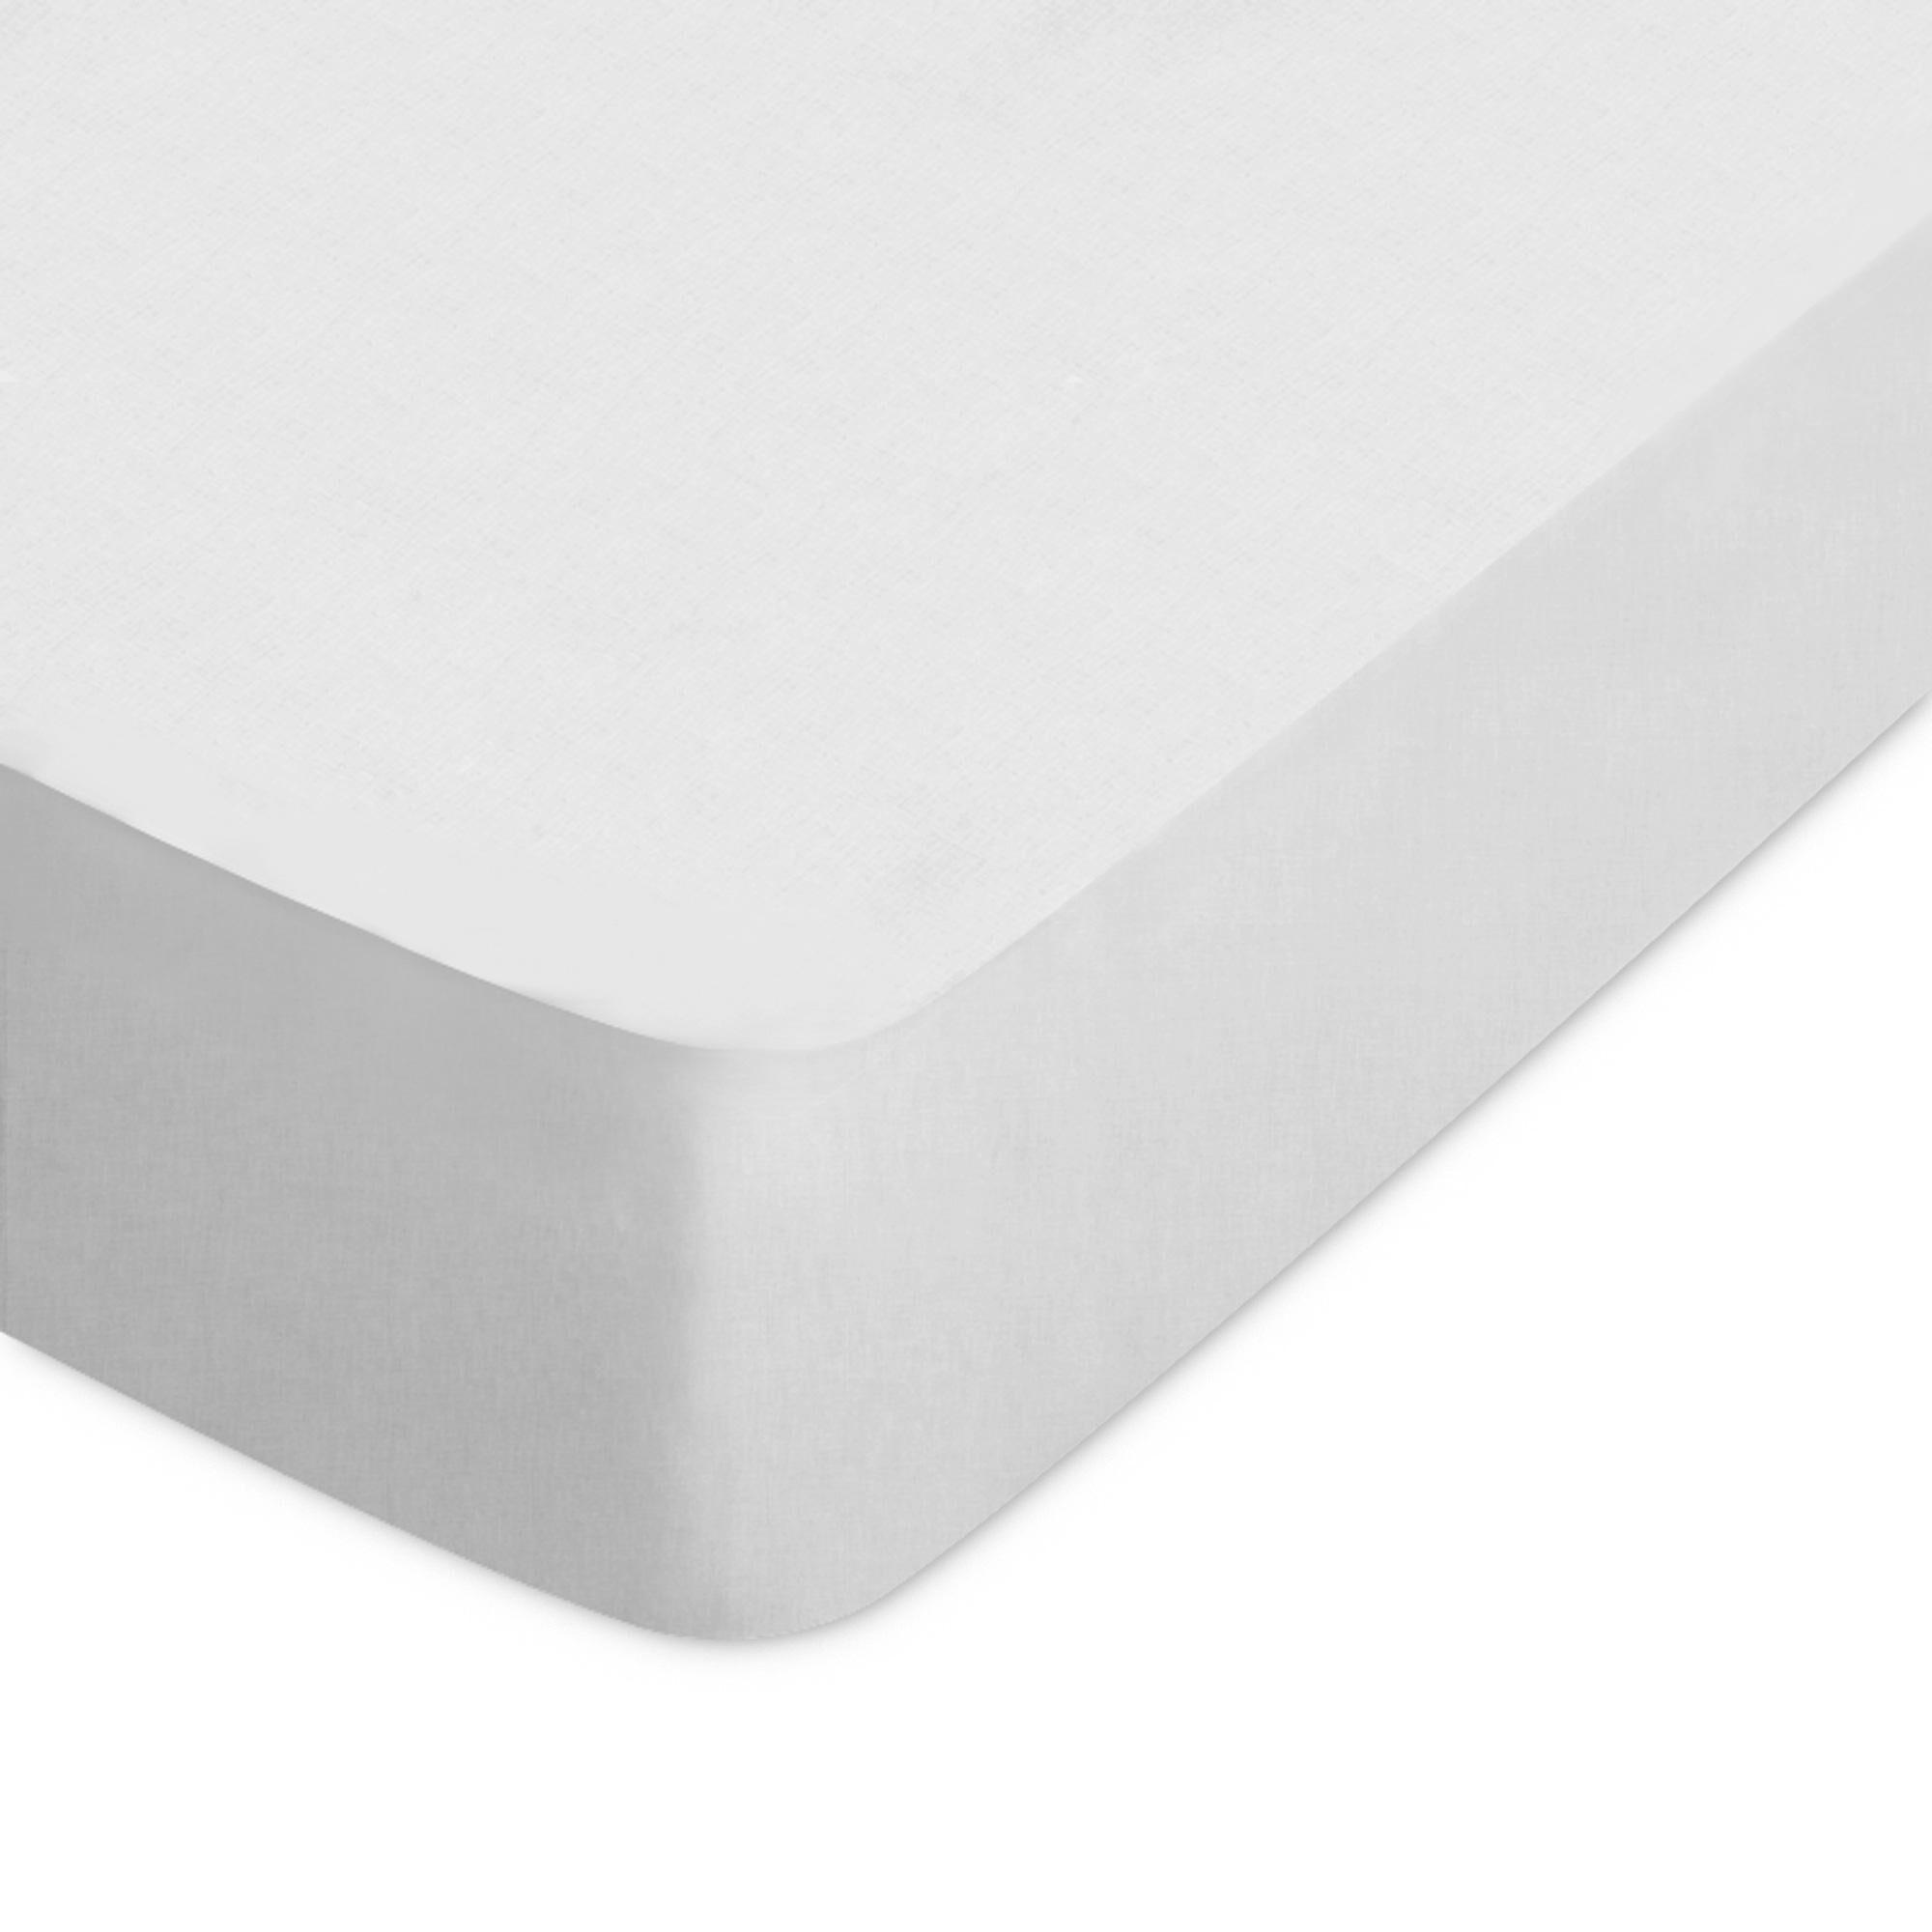 Linnea Drap housse uni 60x120 cm 100% coton ALTO Calcium